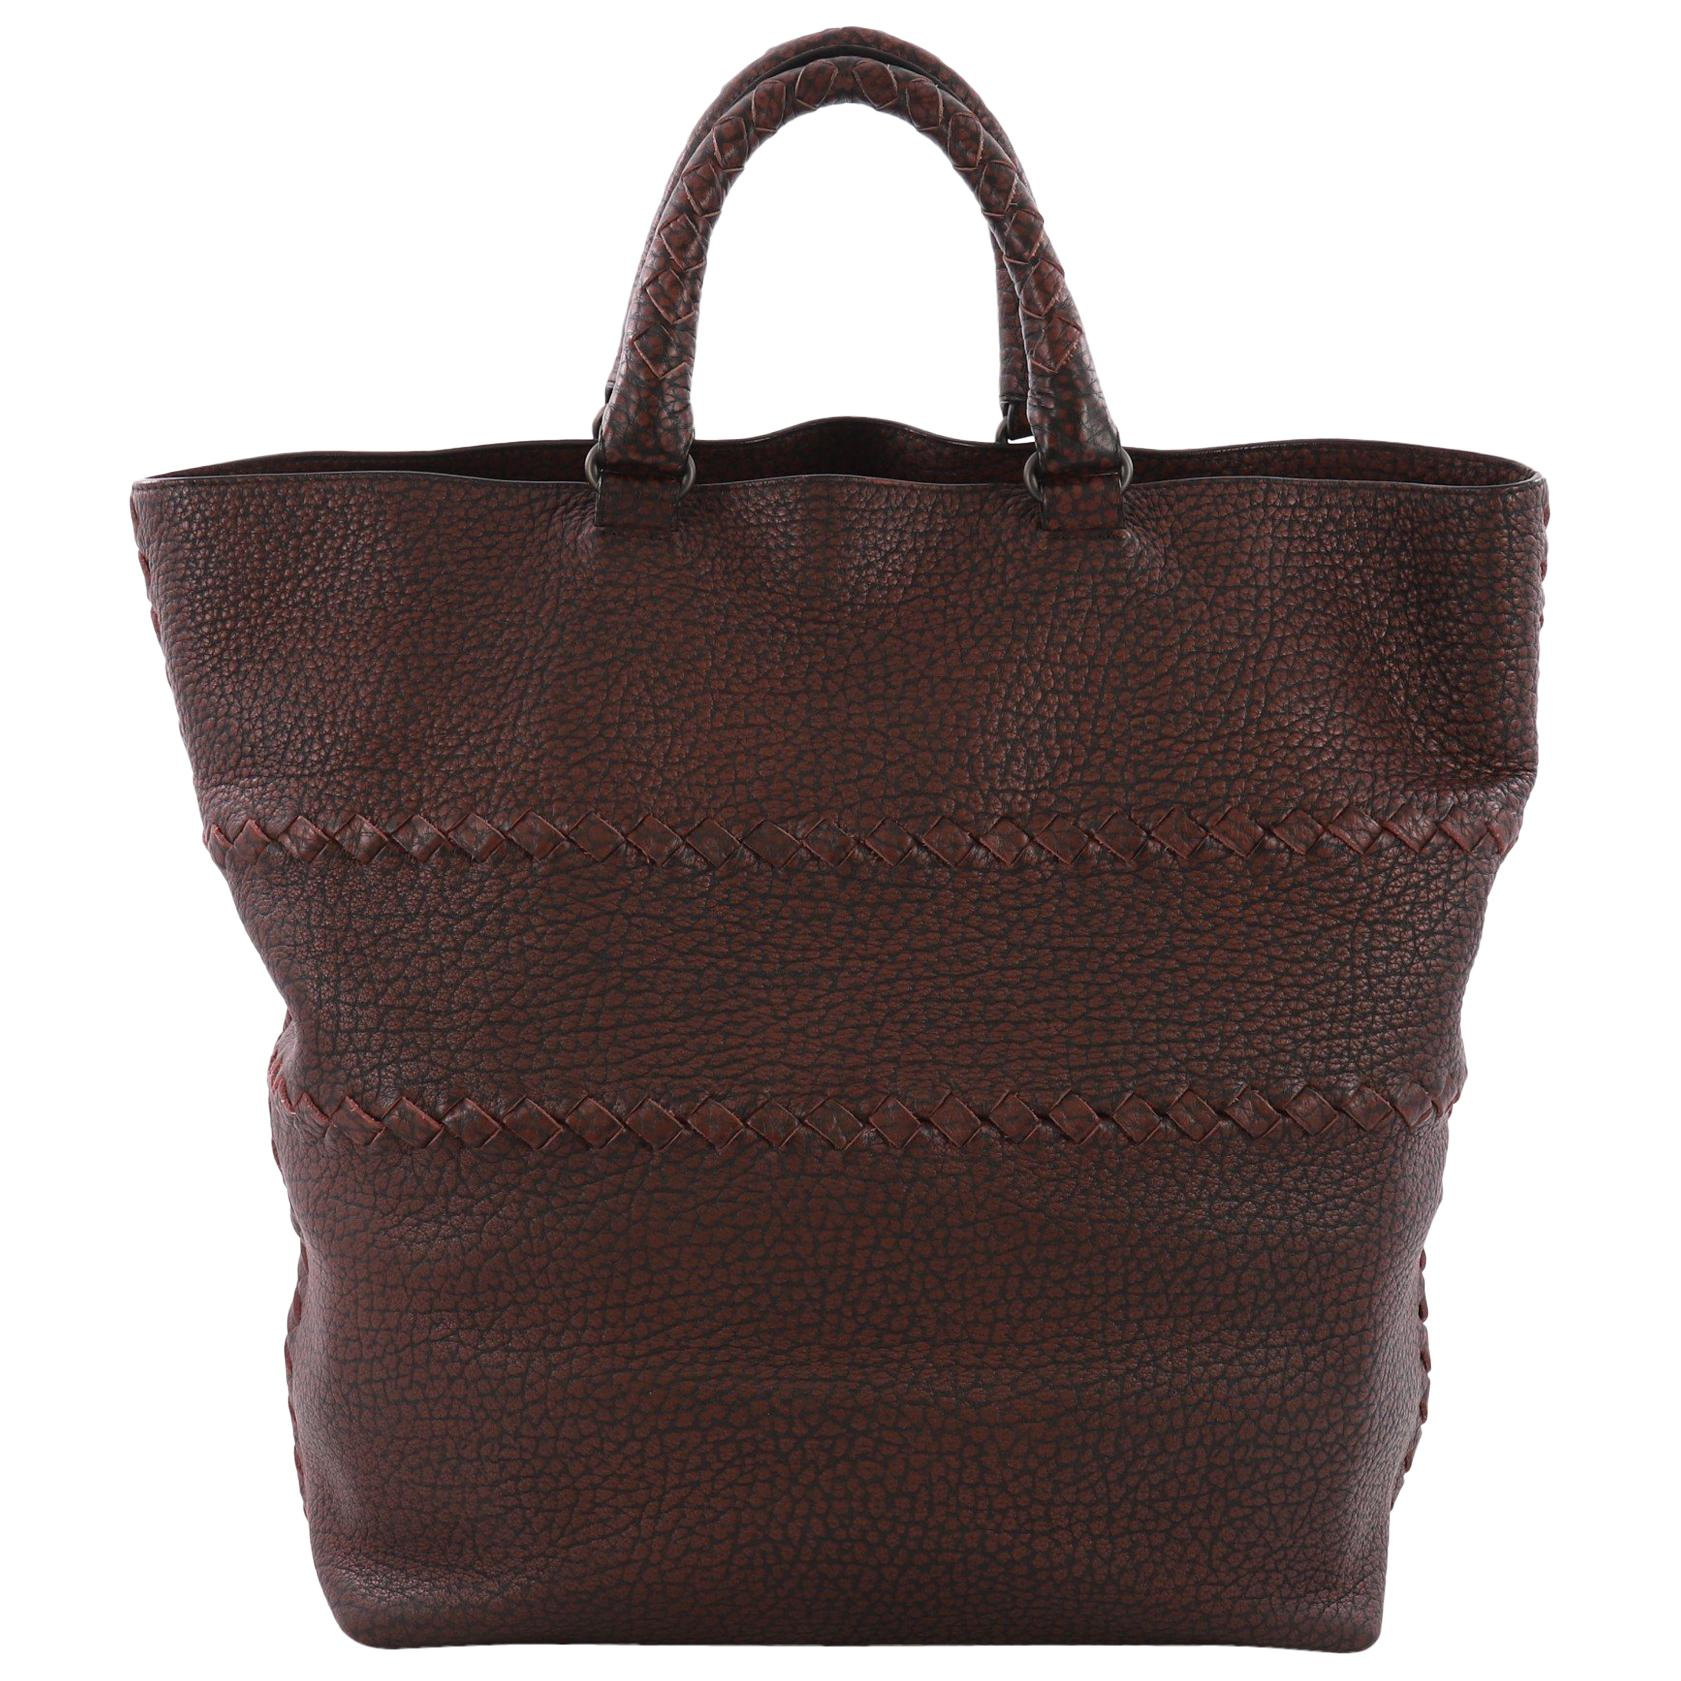 01f1ad2fae62 Rebag Top Handle Bags - 1stdibs - Page 18